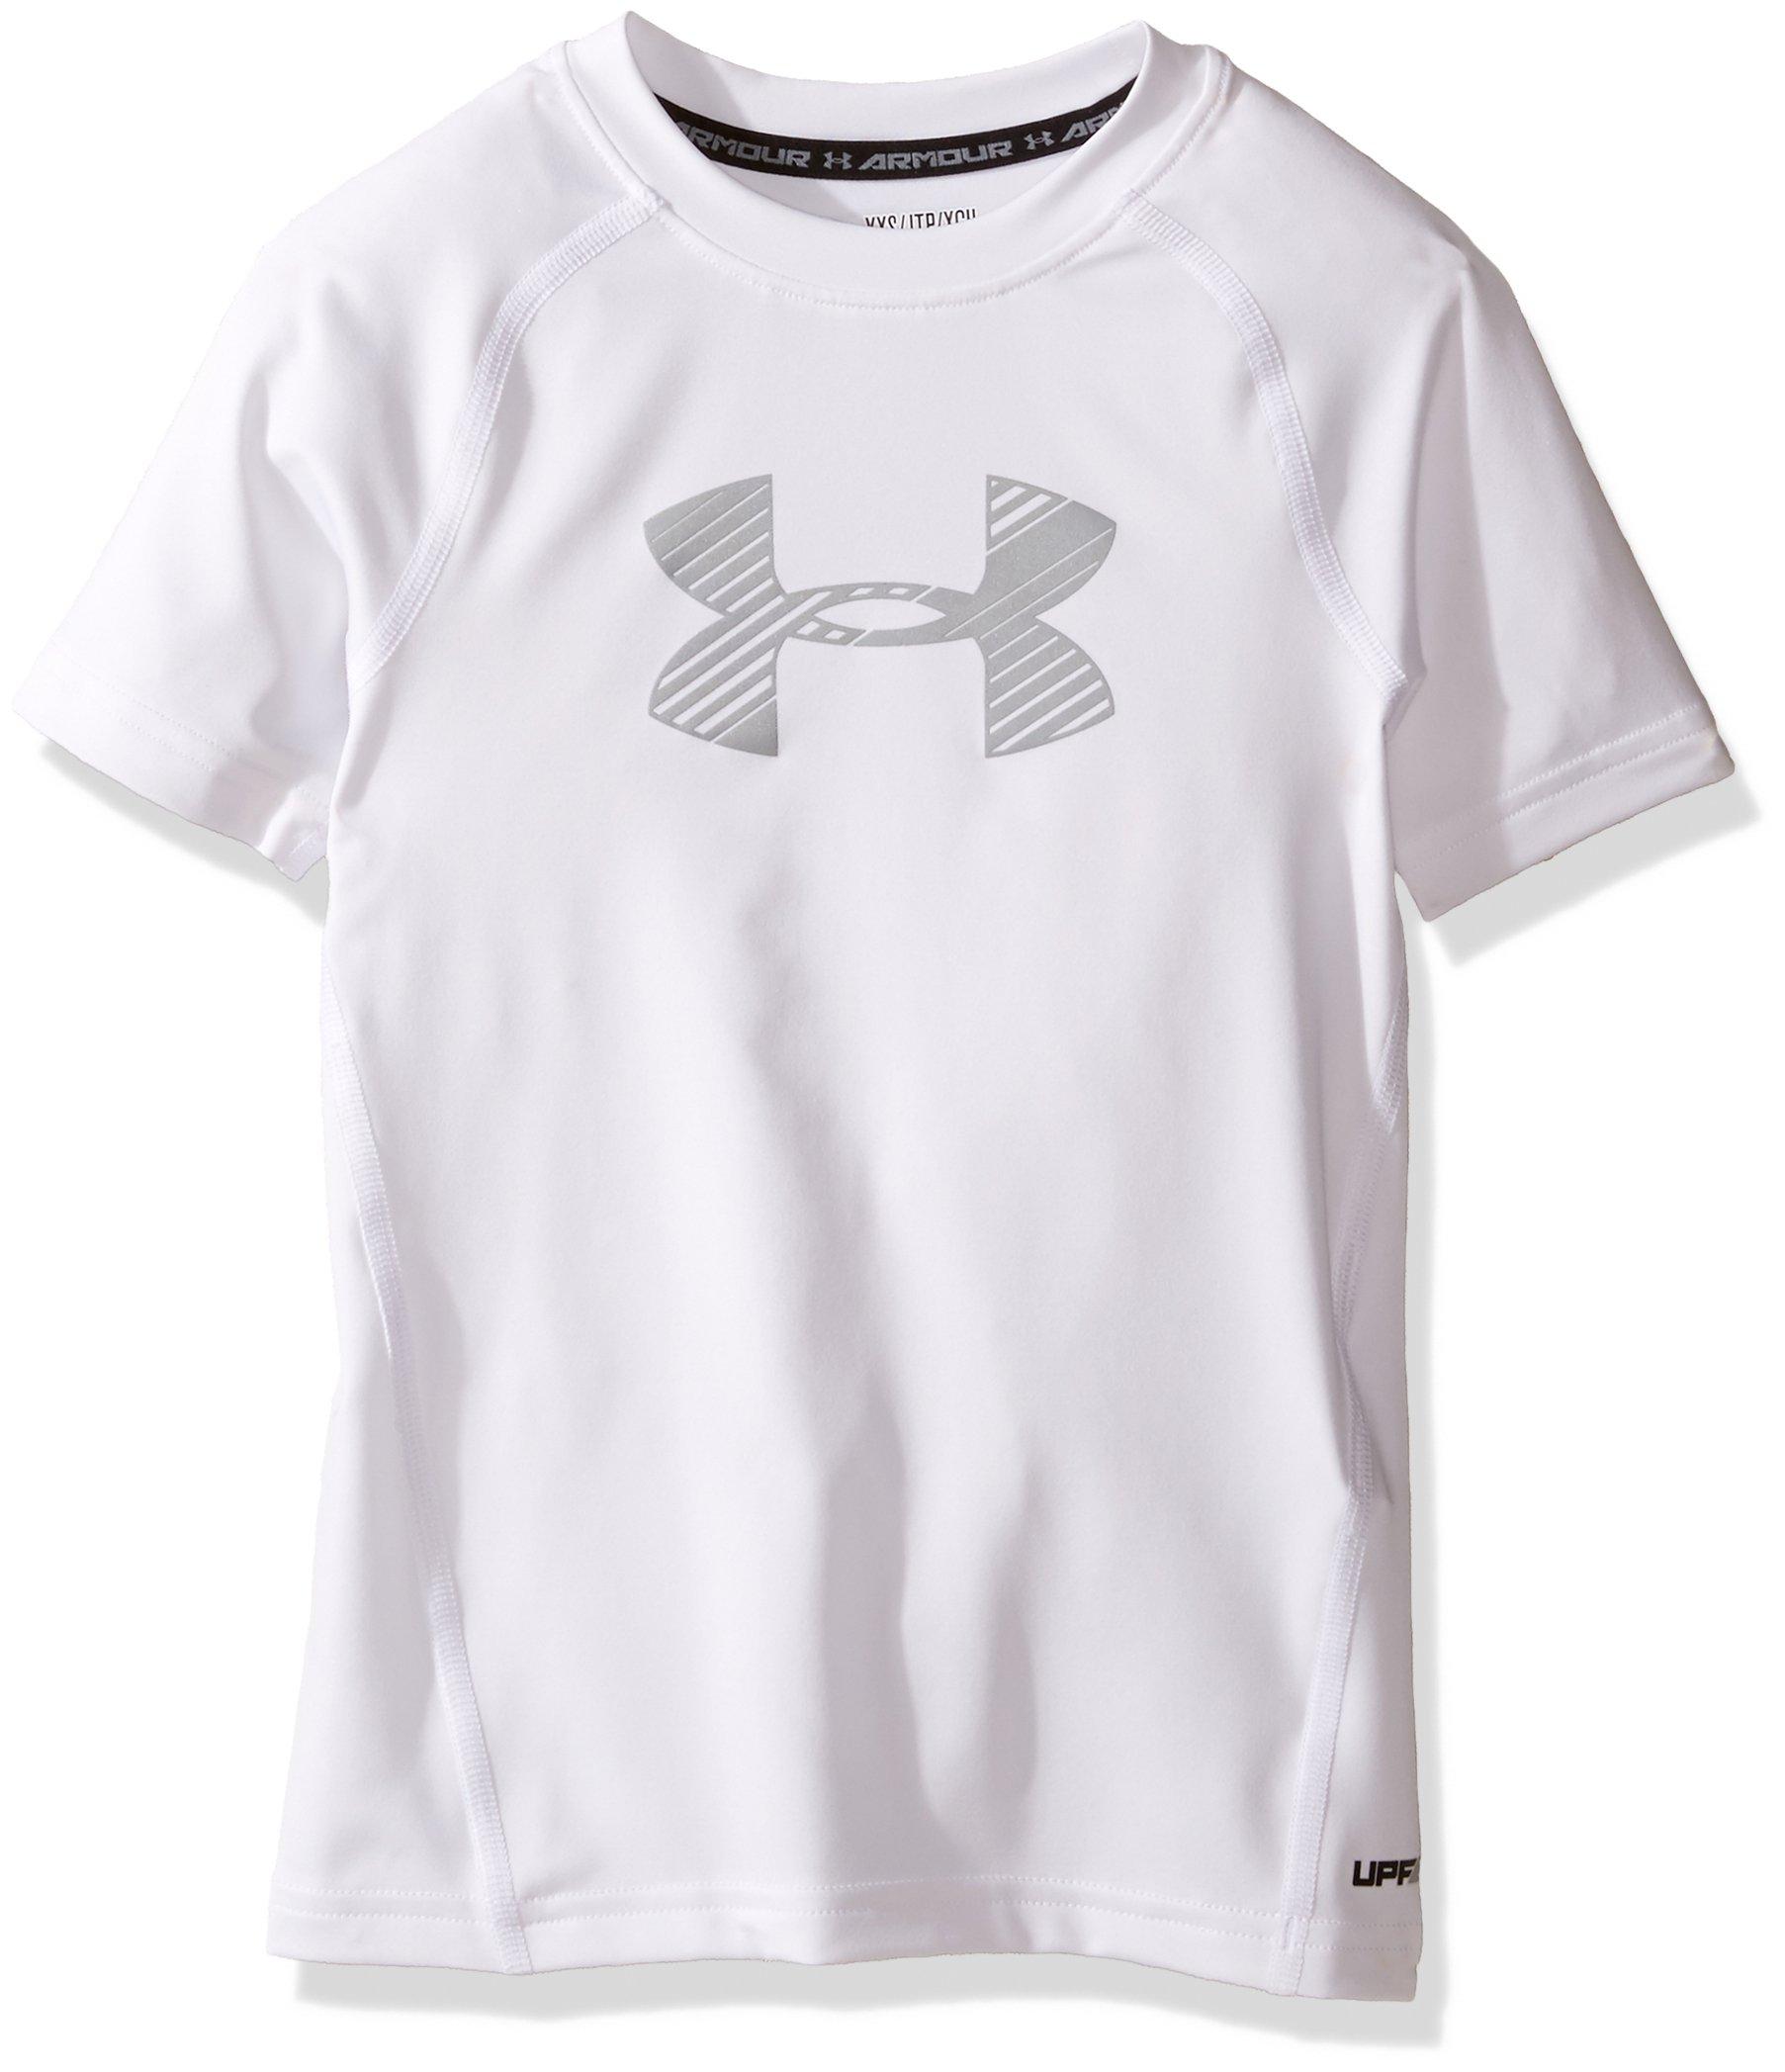 557d7a4052 Under Armour Boys Heatgear Armour Short Sleeve Fitted Shirt, White  (101)/Overcast Gray, Youth X-Small